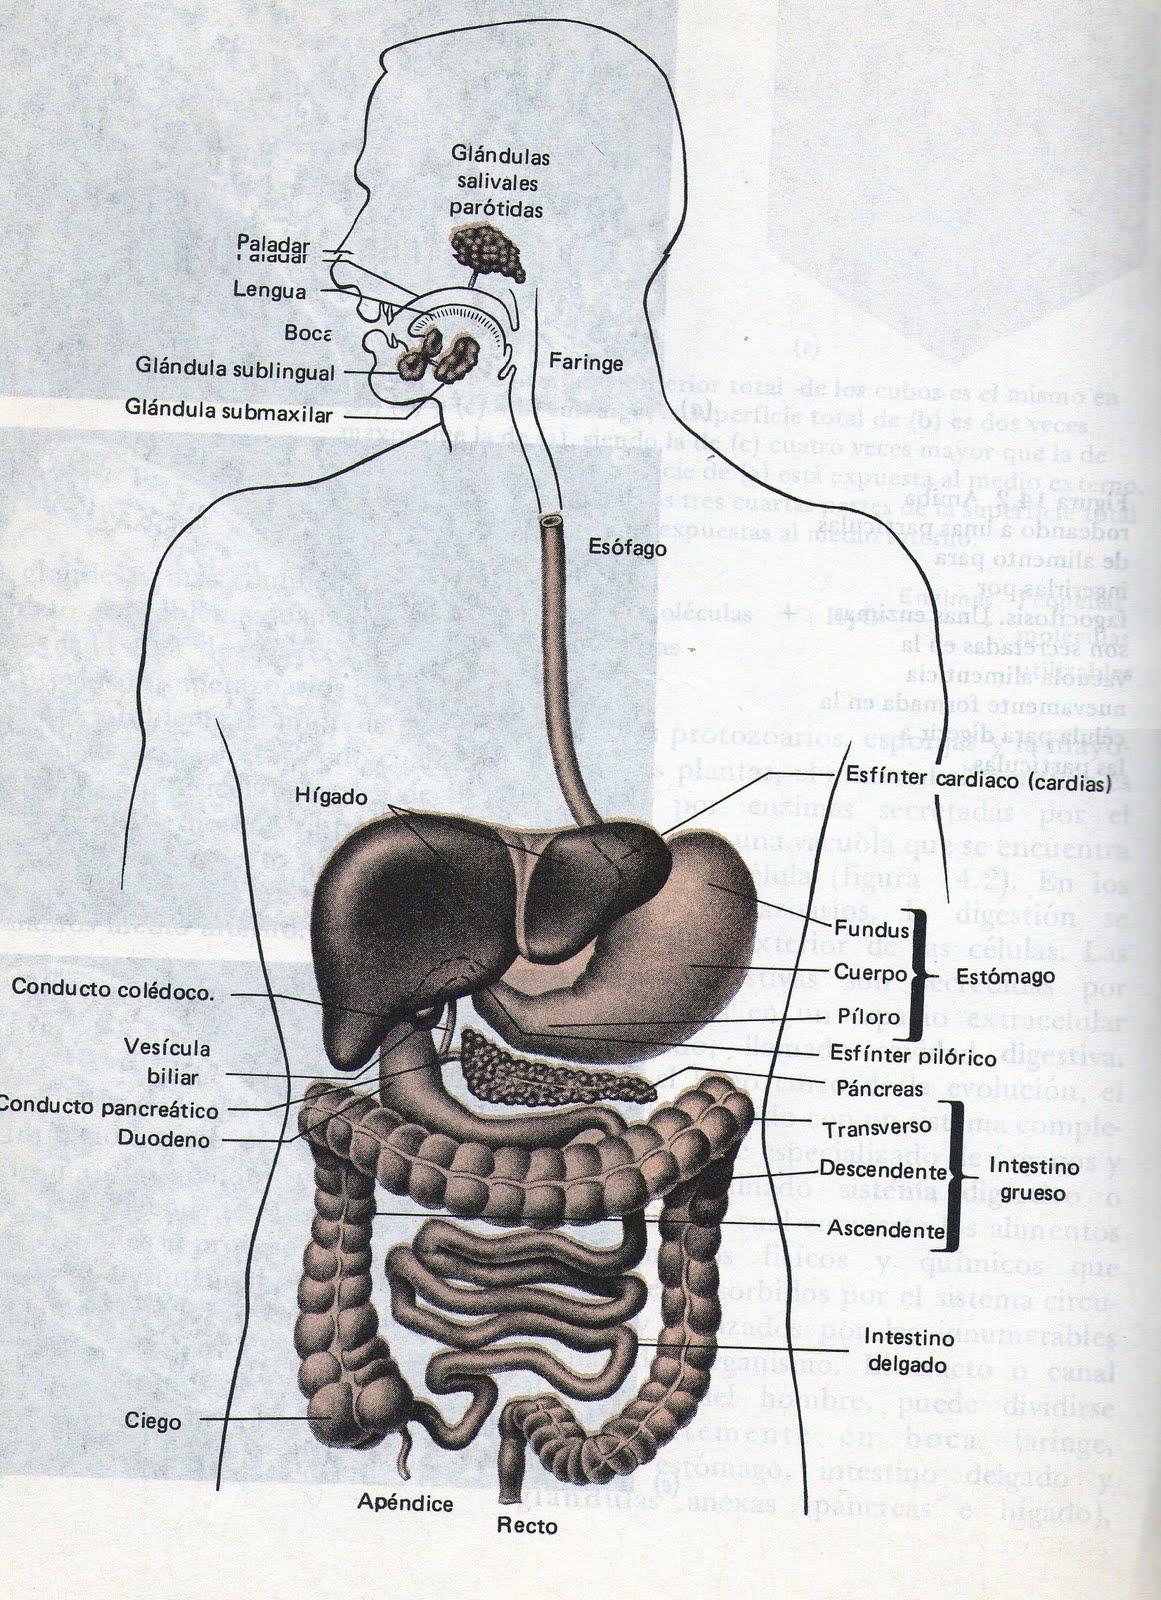 Biologia III y IV.: agosto 2010